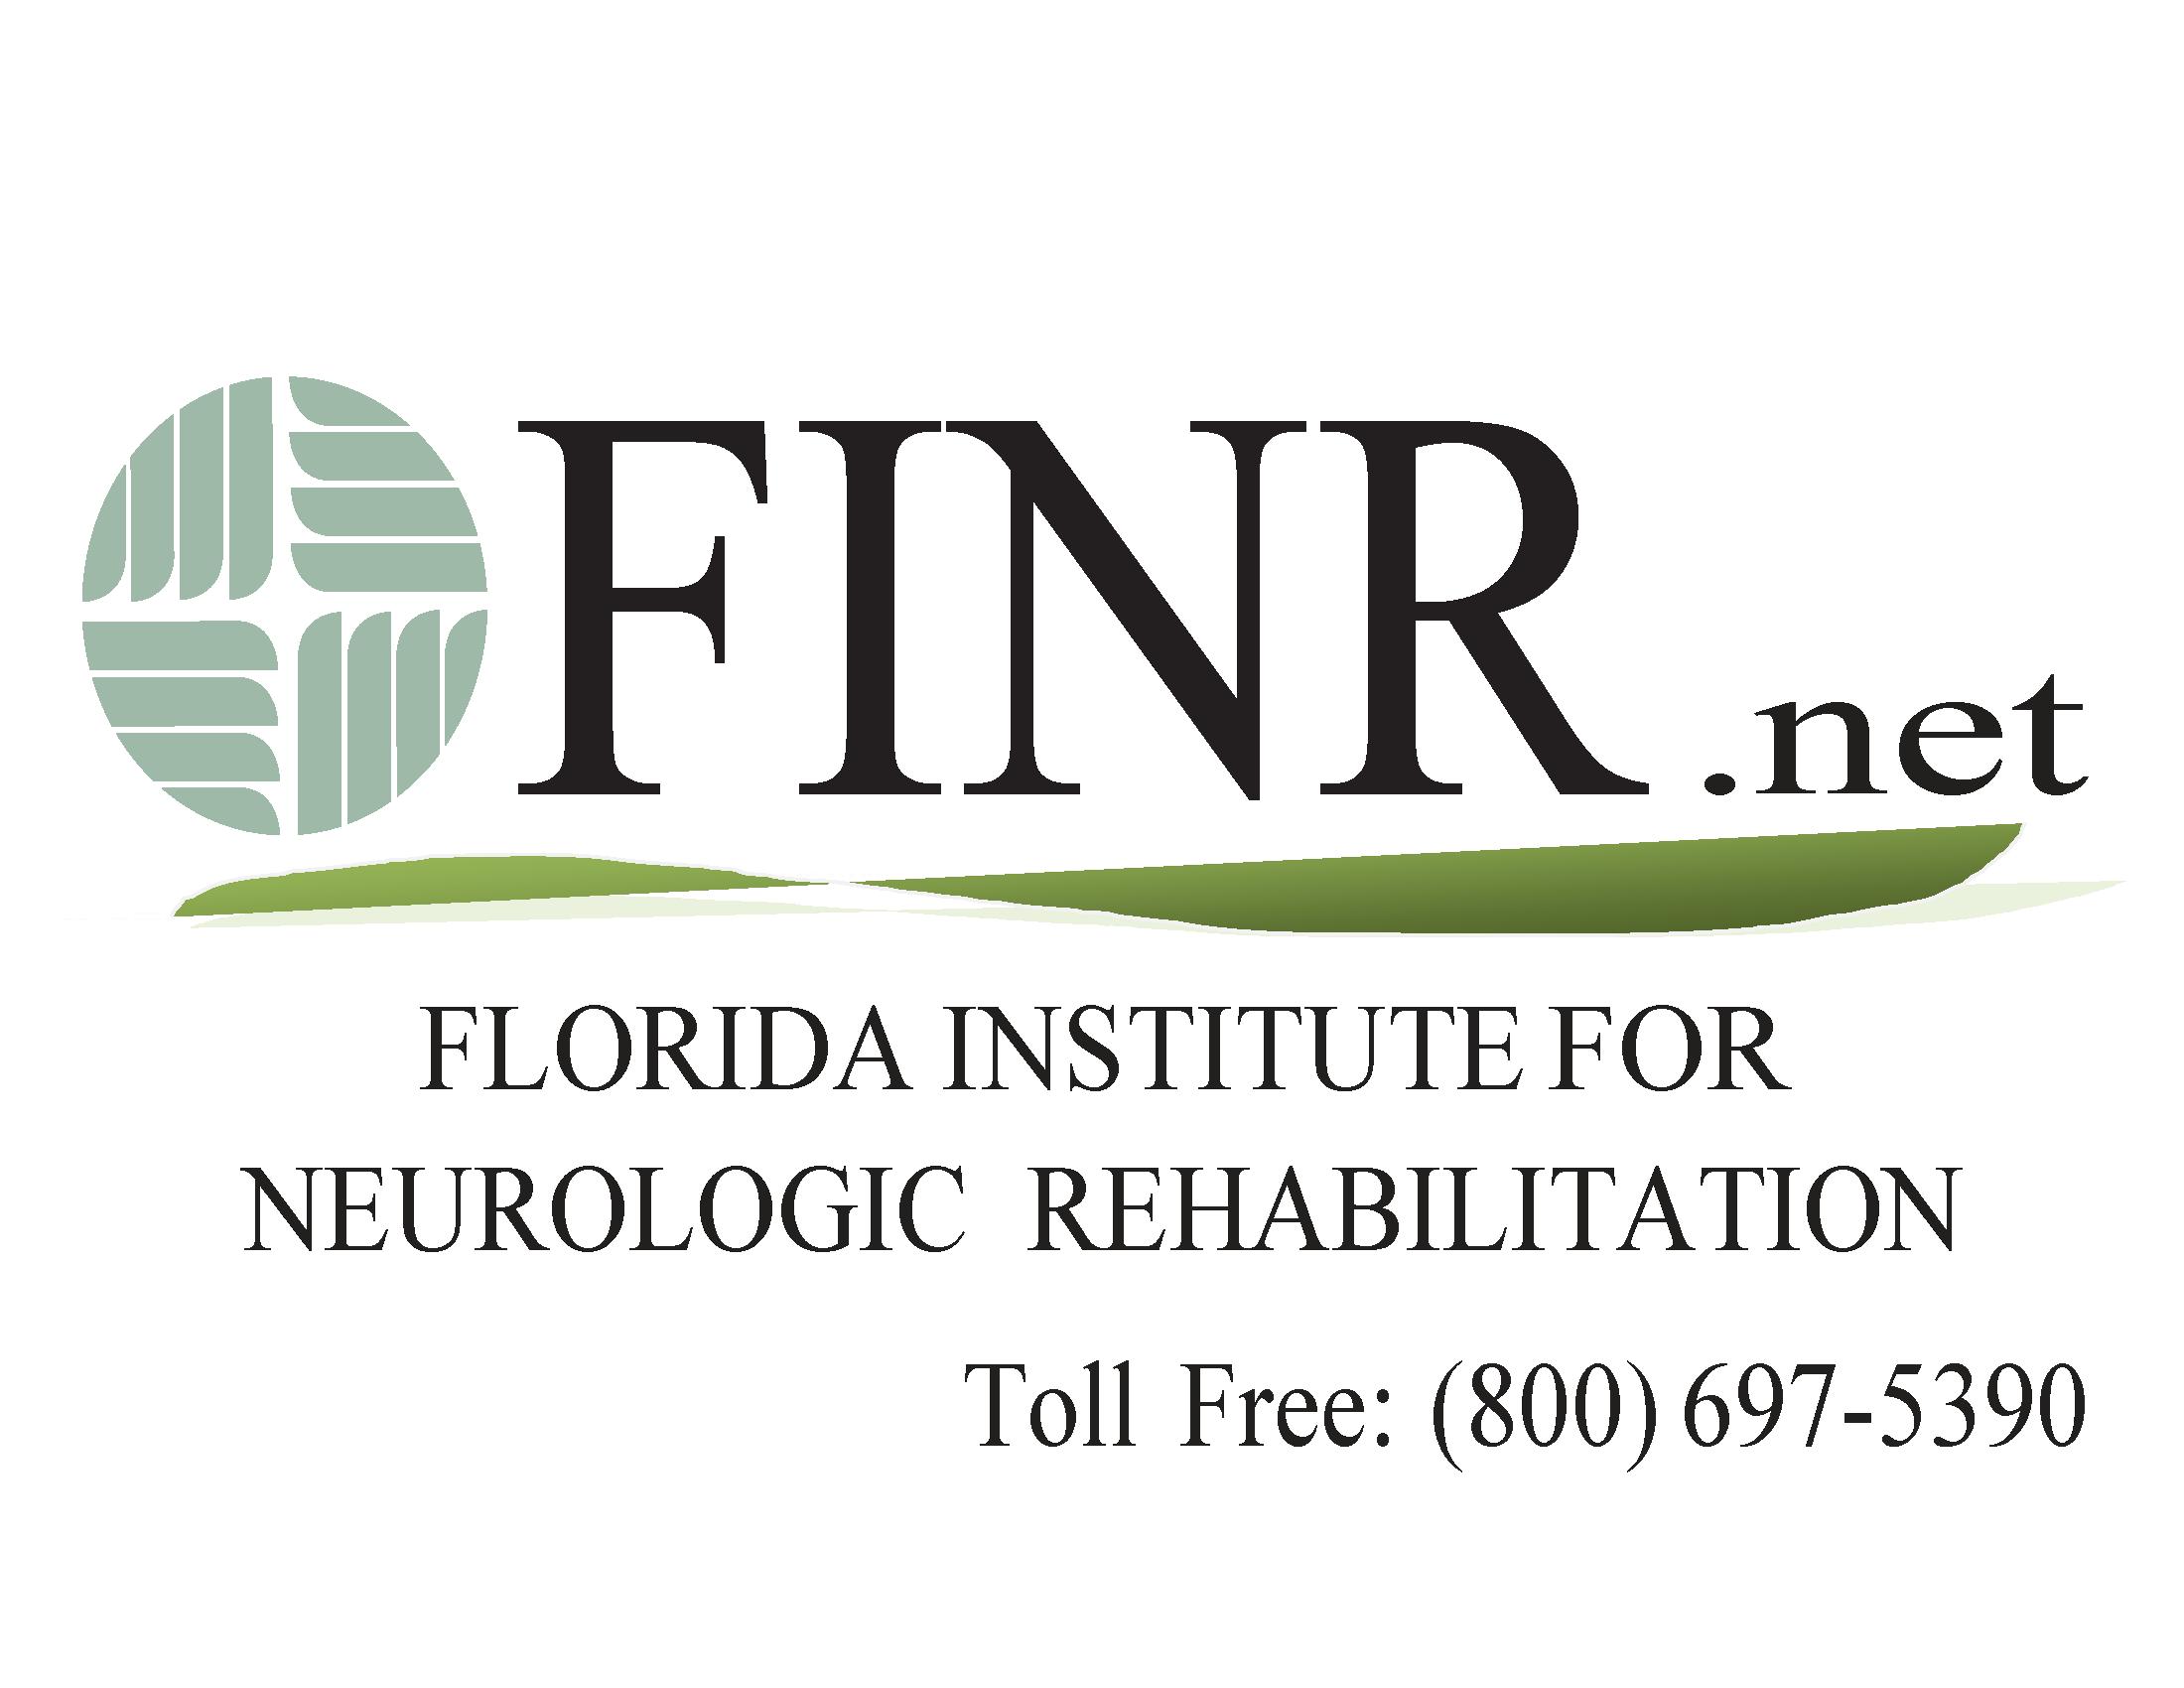 Florida Institute for Neurologic Rehabilitation